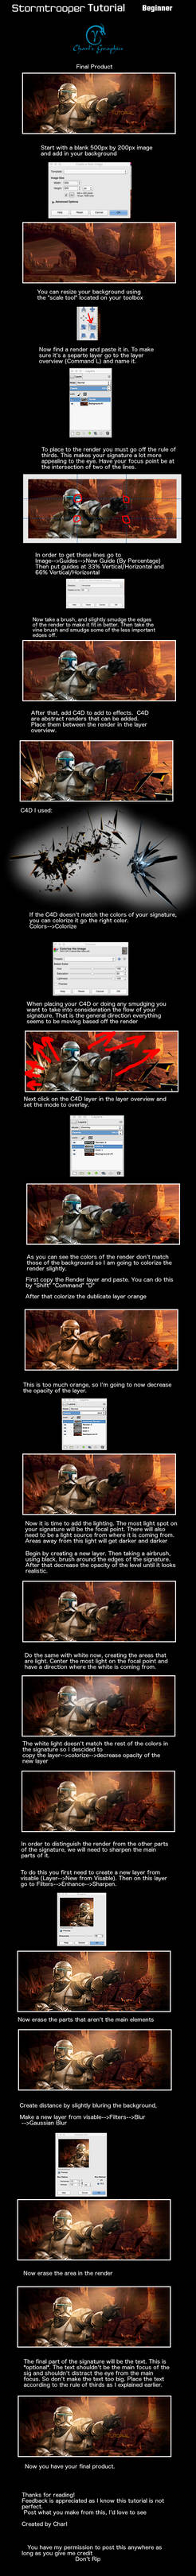 StormTrooper Tutorial